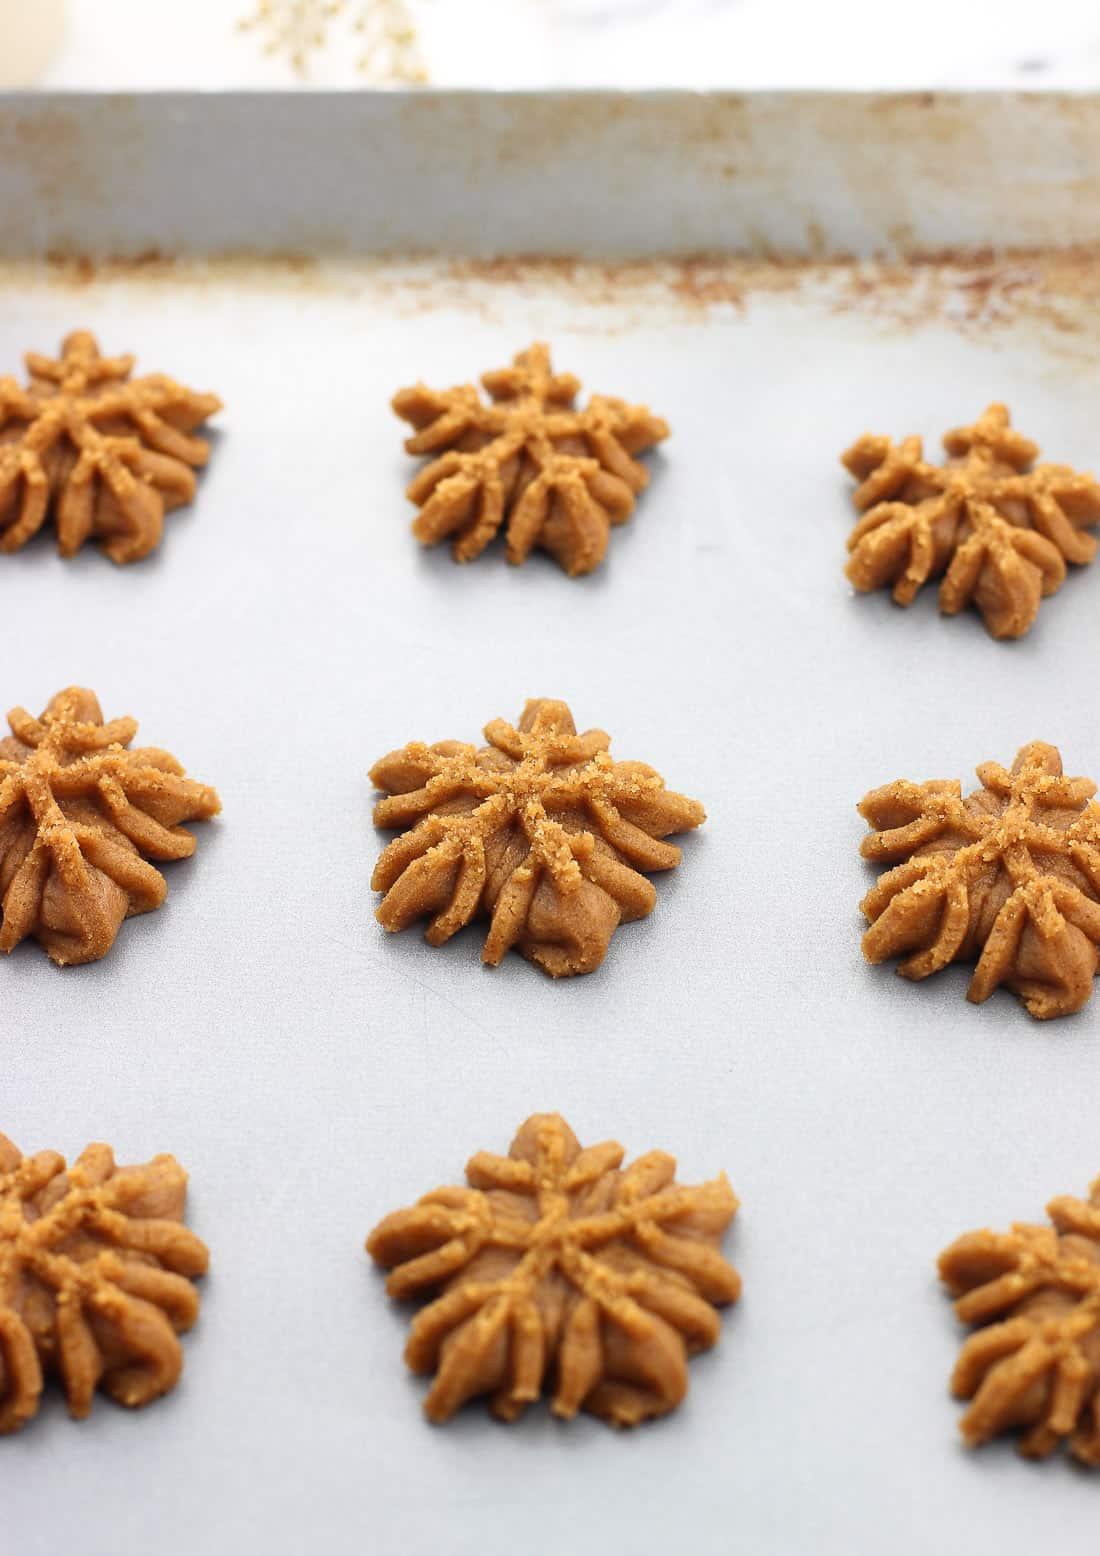 Snowflake-shaped cookies on a metal cookie sheet before being baked